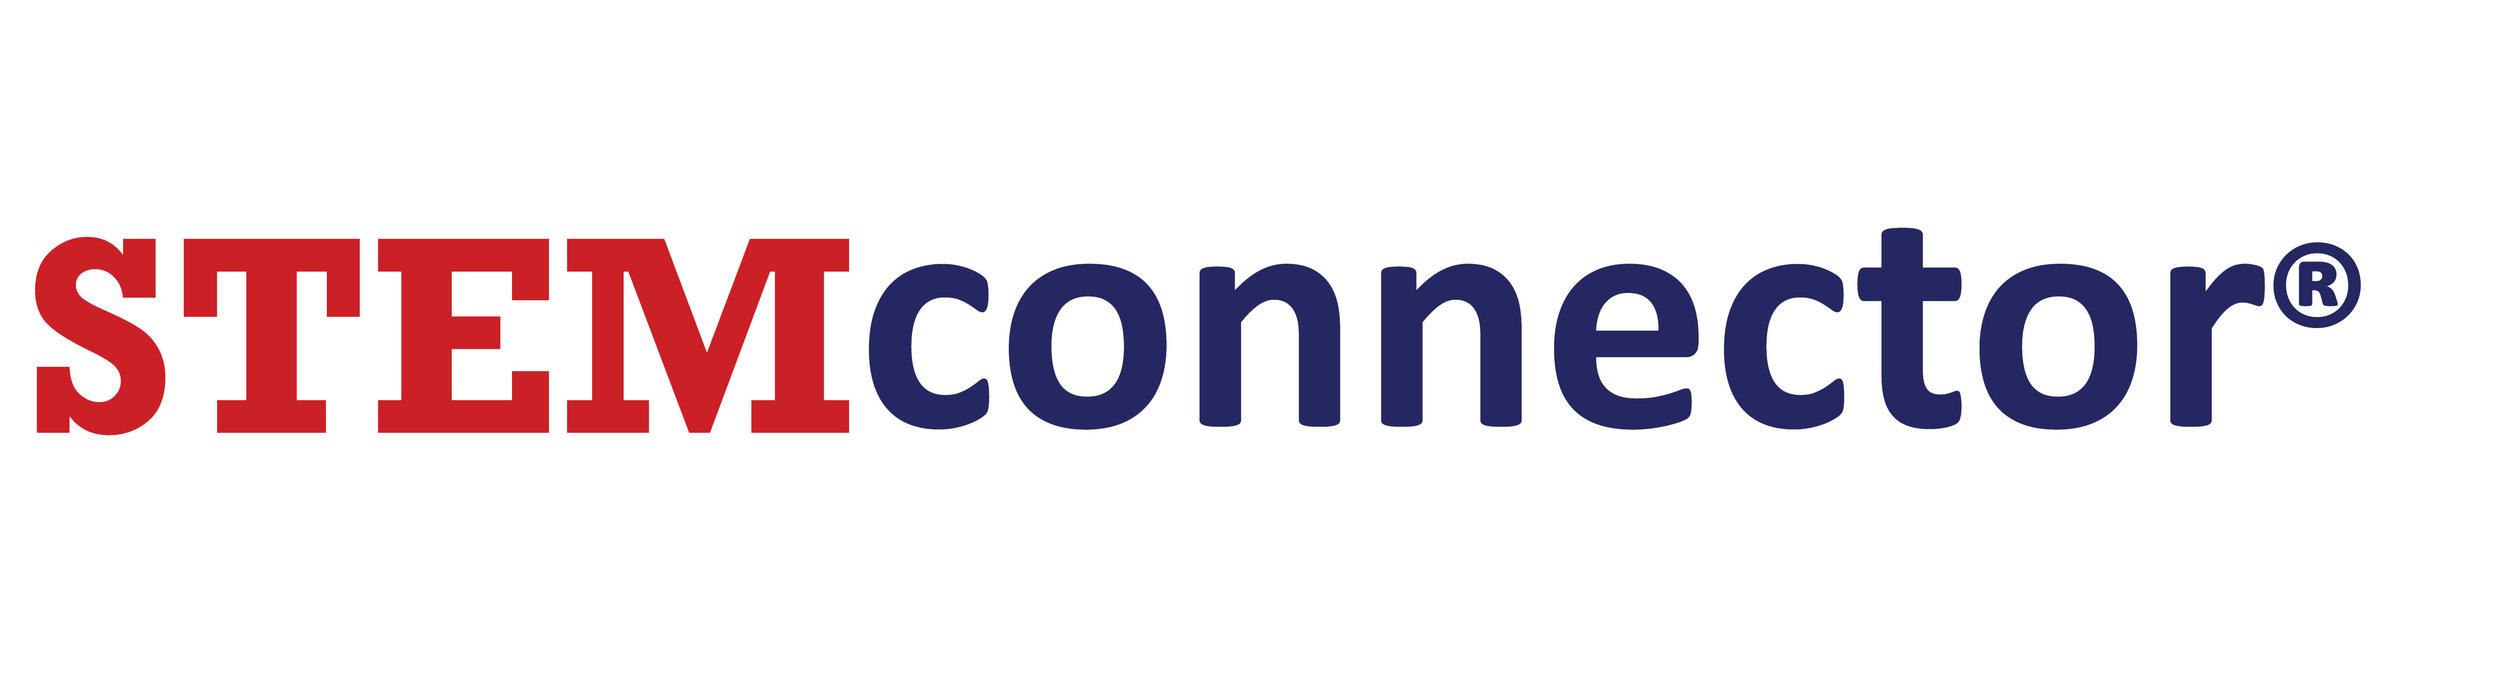 STEM CONNECTOR non mod ORG.jpg